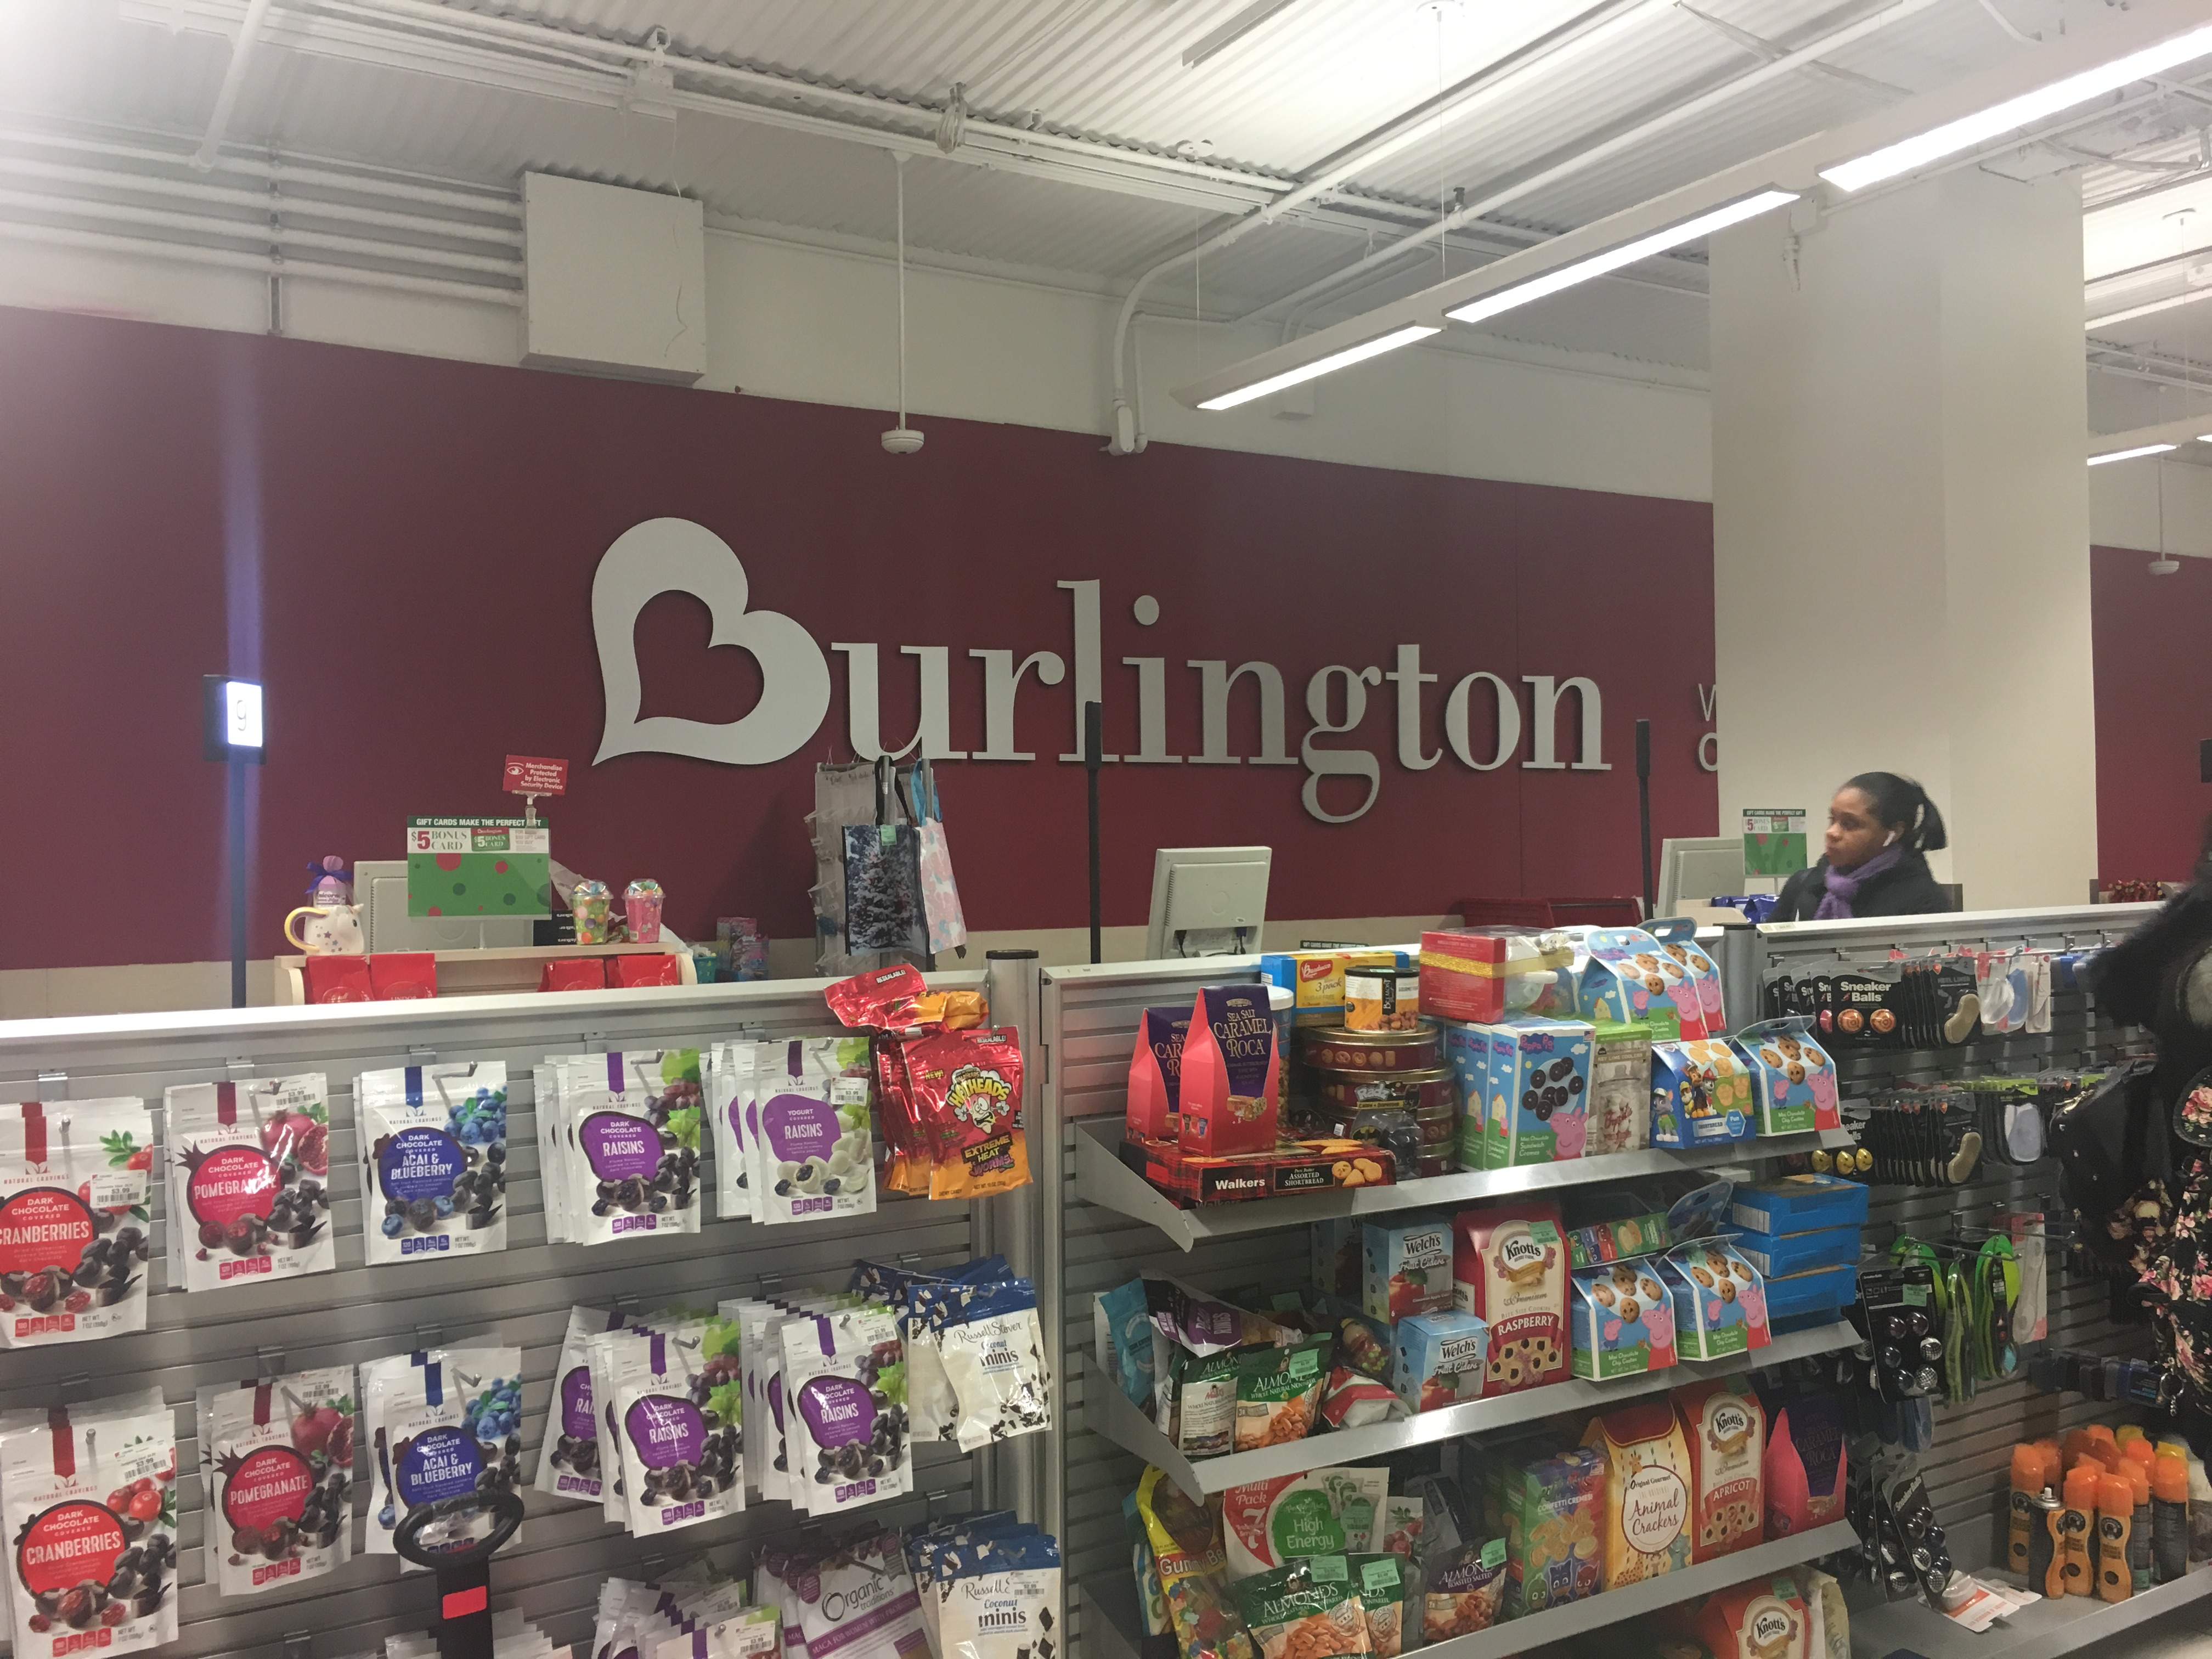 www.burlingtonfeedback.com